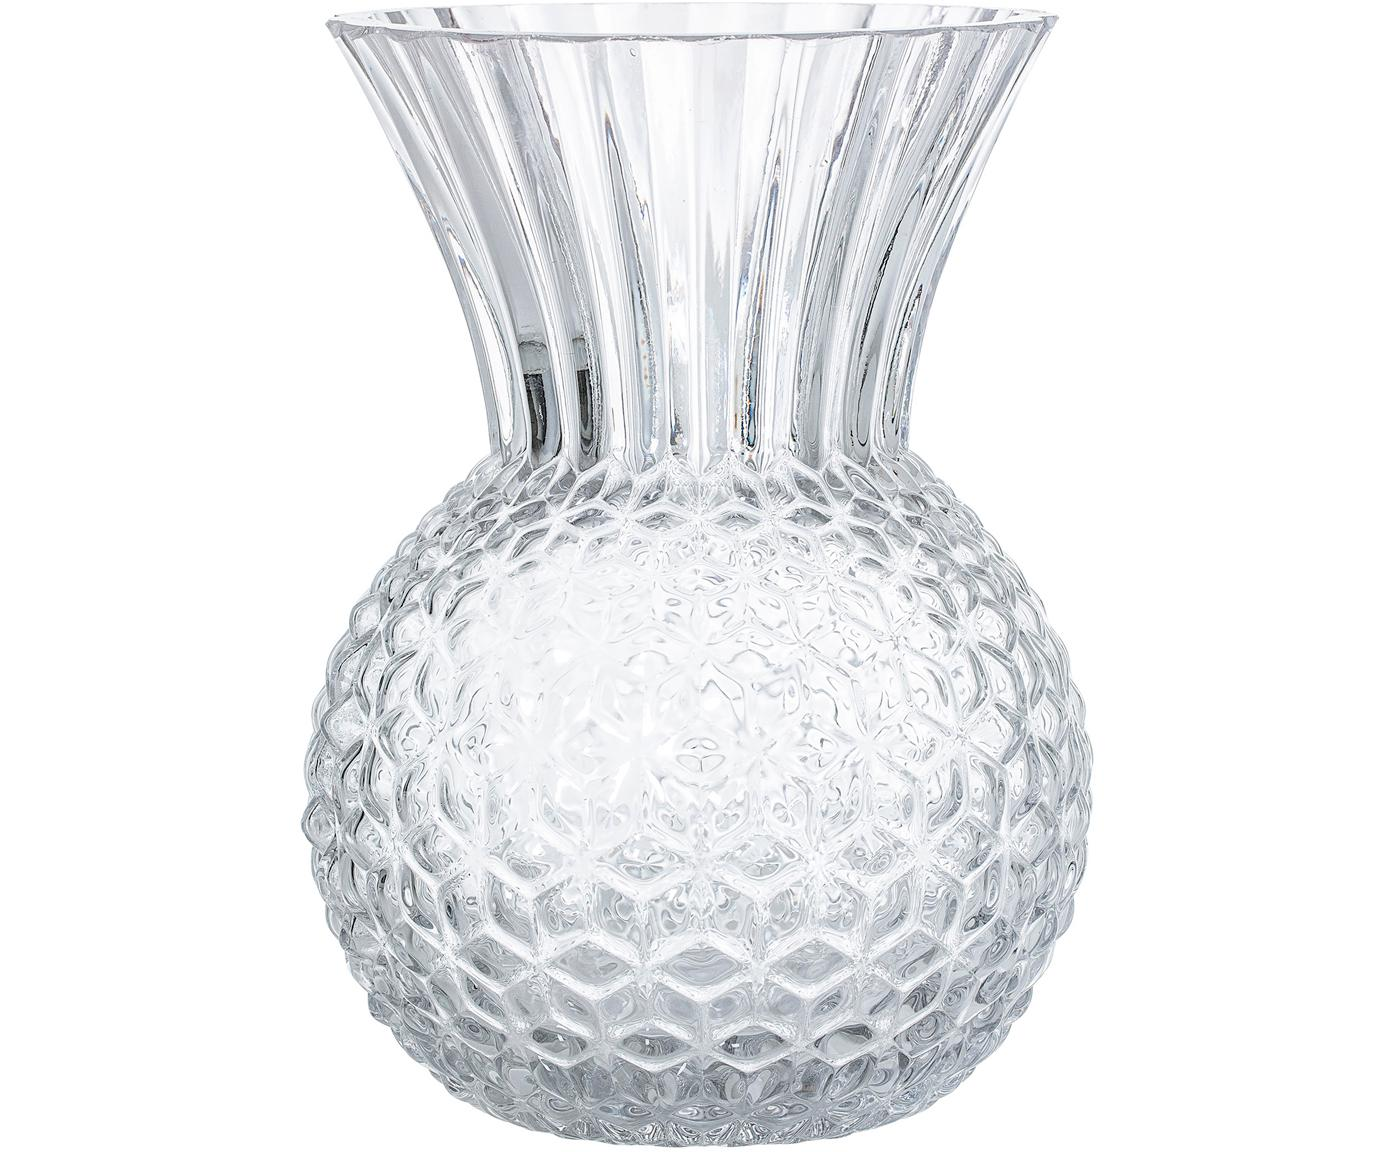 Jarrón de vidrio Clear, Vidrio, Transparente, Ø 13 cm